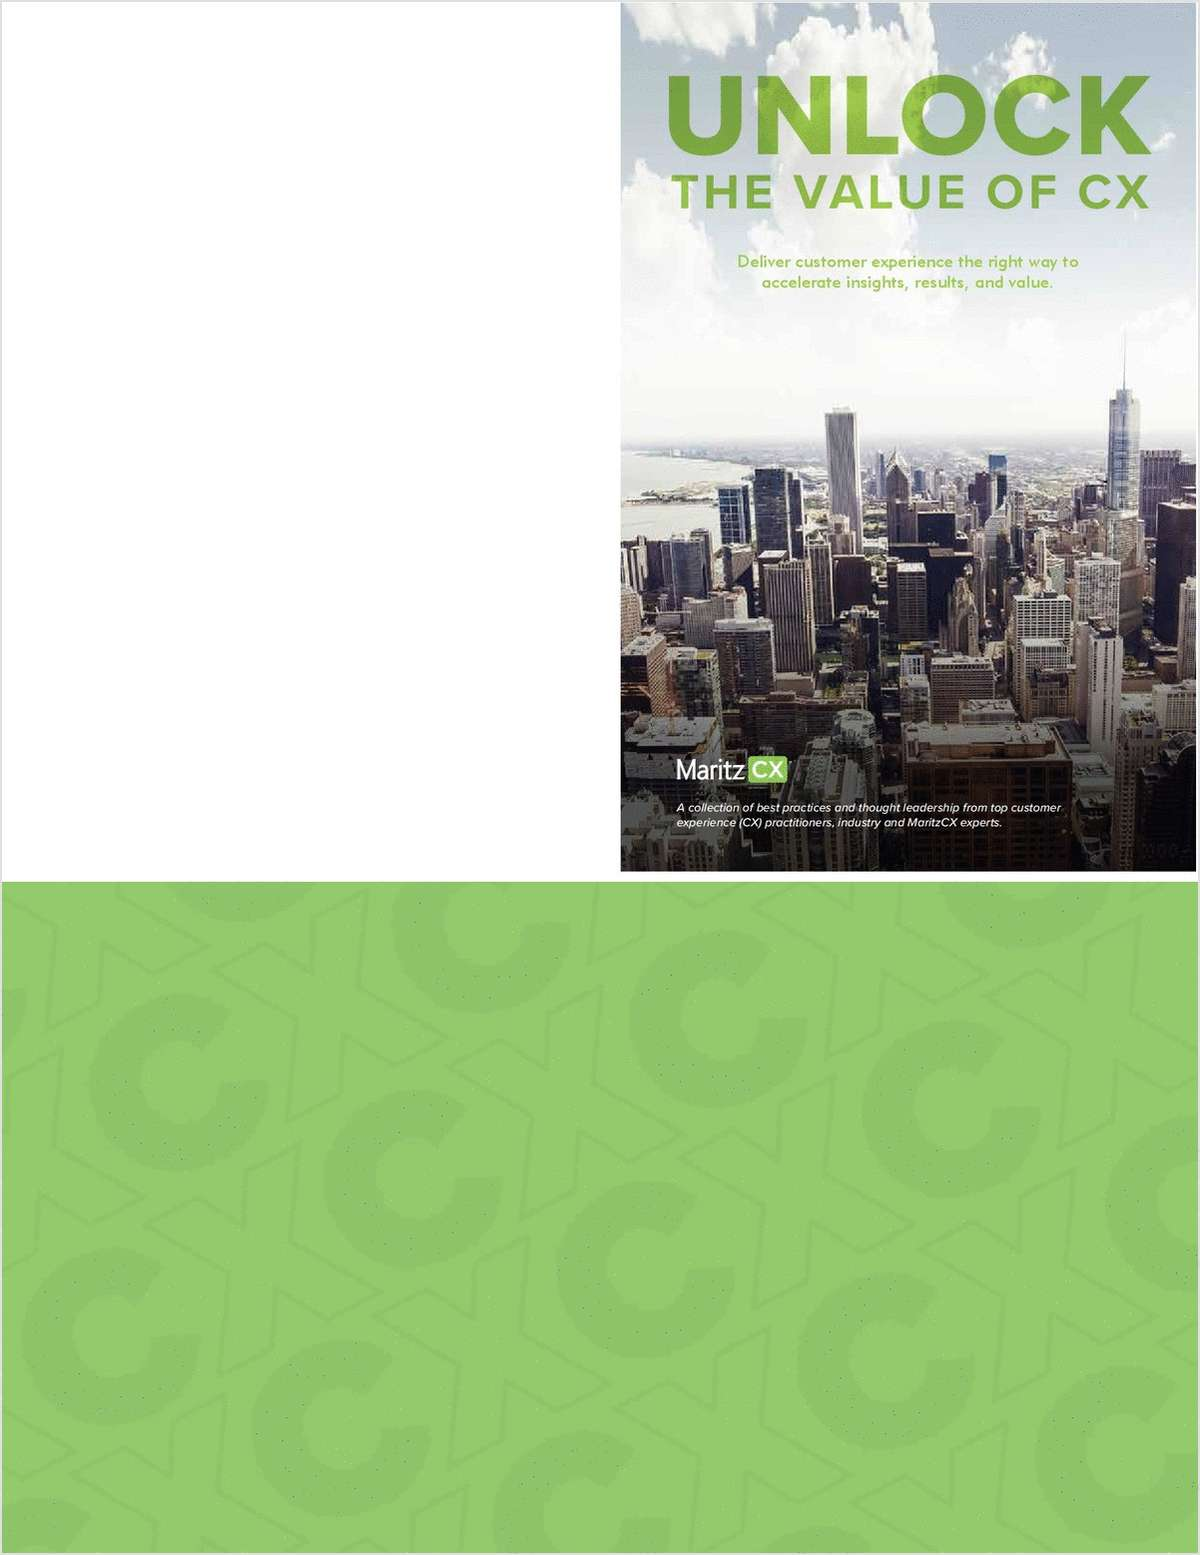 Unlock The Value of CX